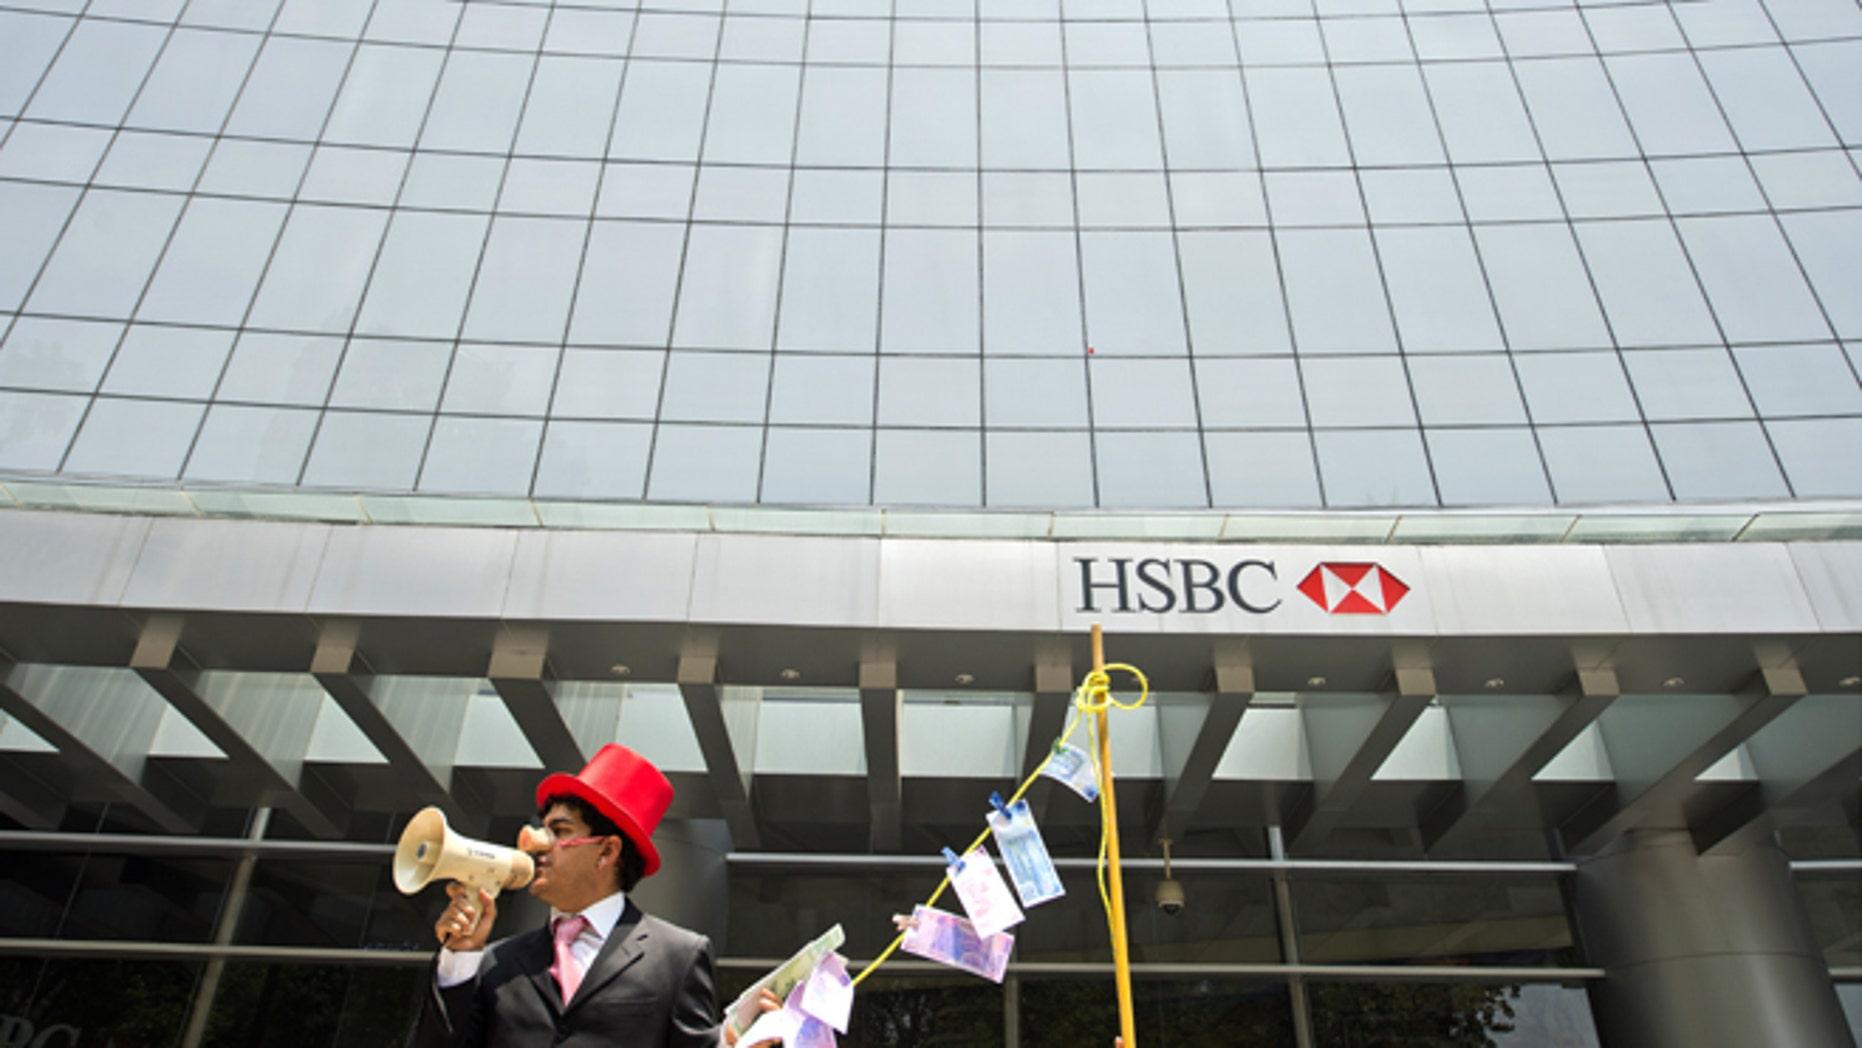 HSBC knowingly helped Mexican cartels launder billions, lawsuit